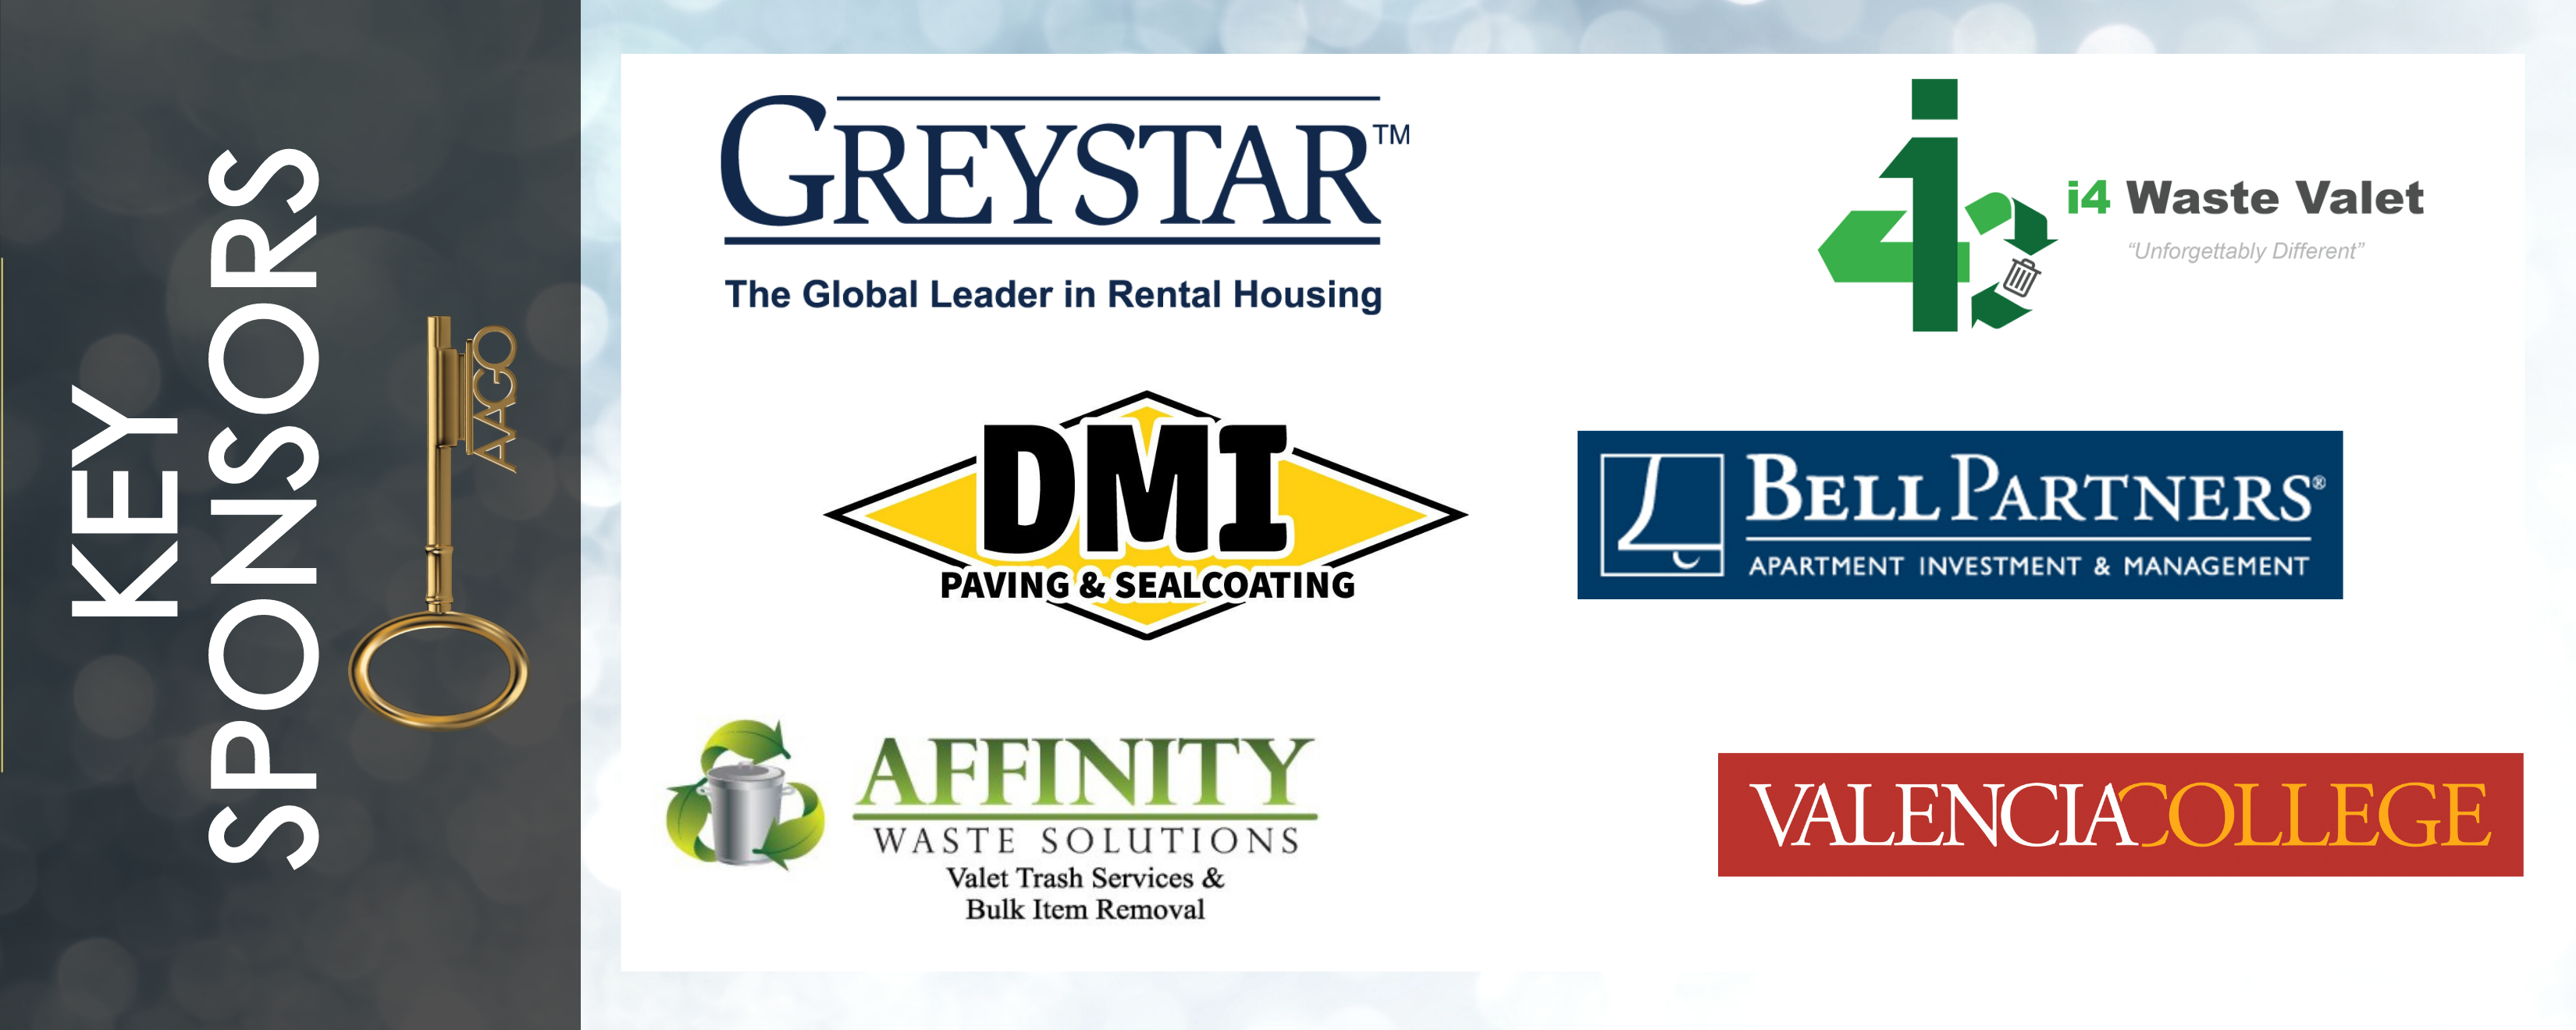 Key Sponsor Graphic Greystar, i4 Waste Valet, Valencia College, DMI Paving & Sealcoating, Affinity Waste, and Bell Partners